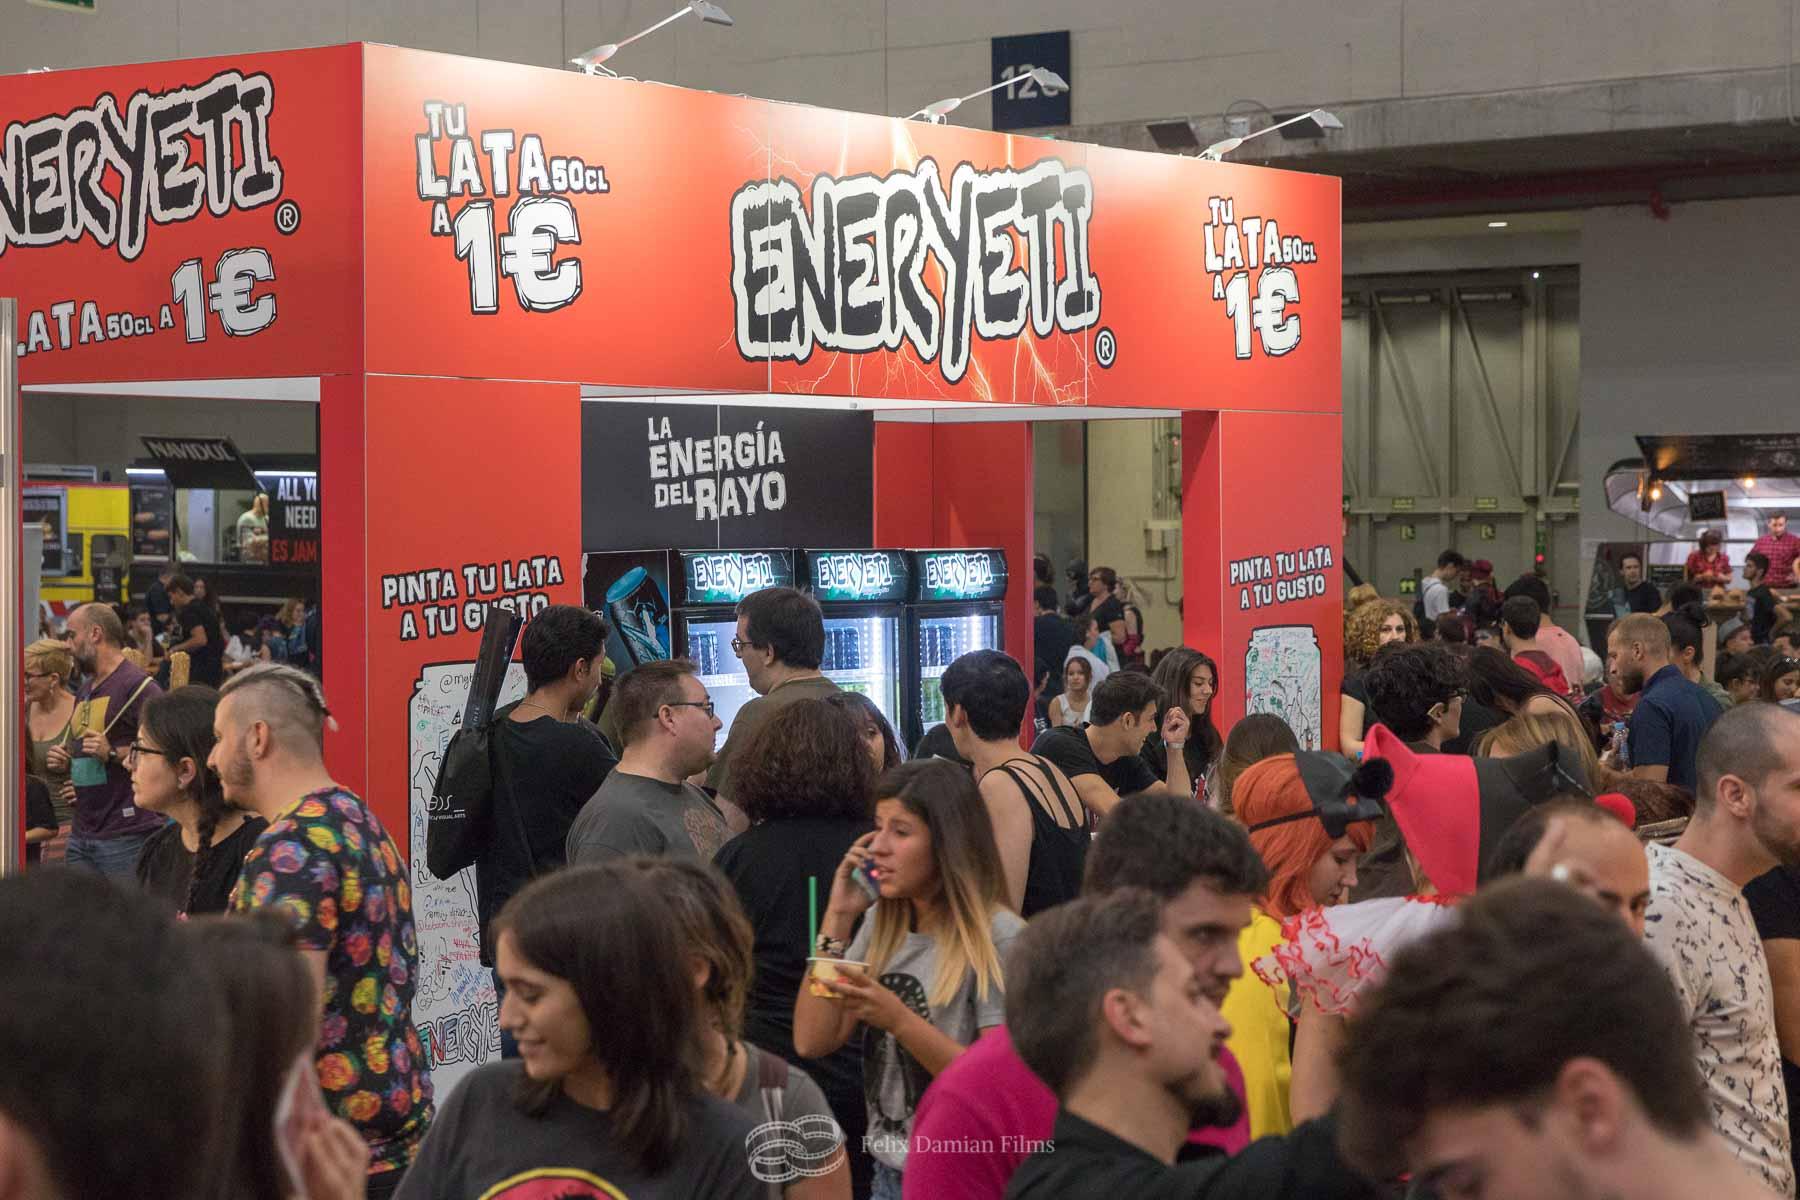 eventos eneryeti ifema-8